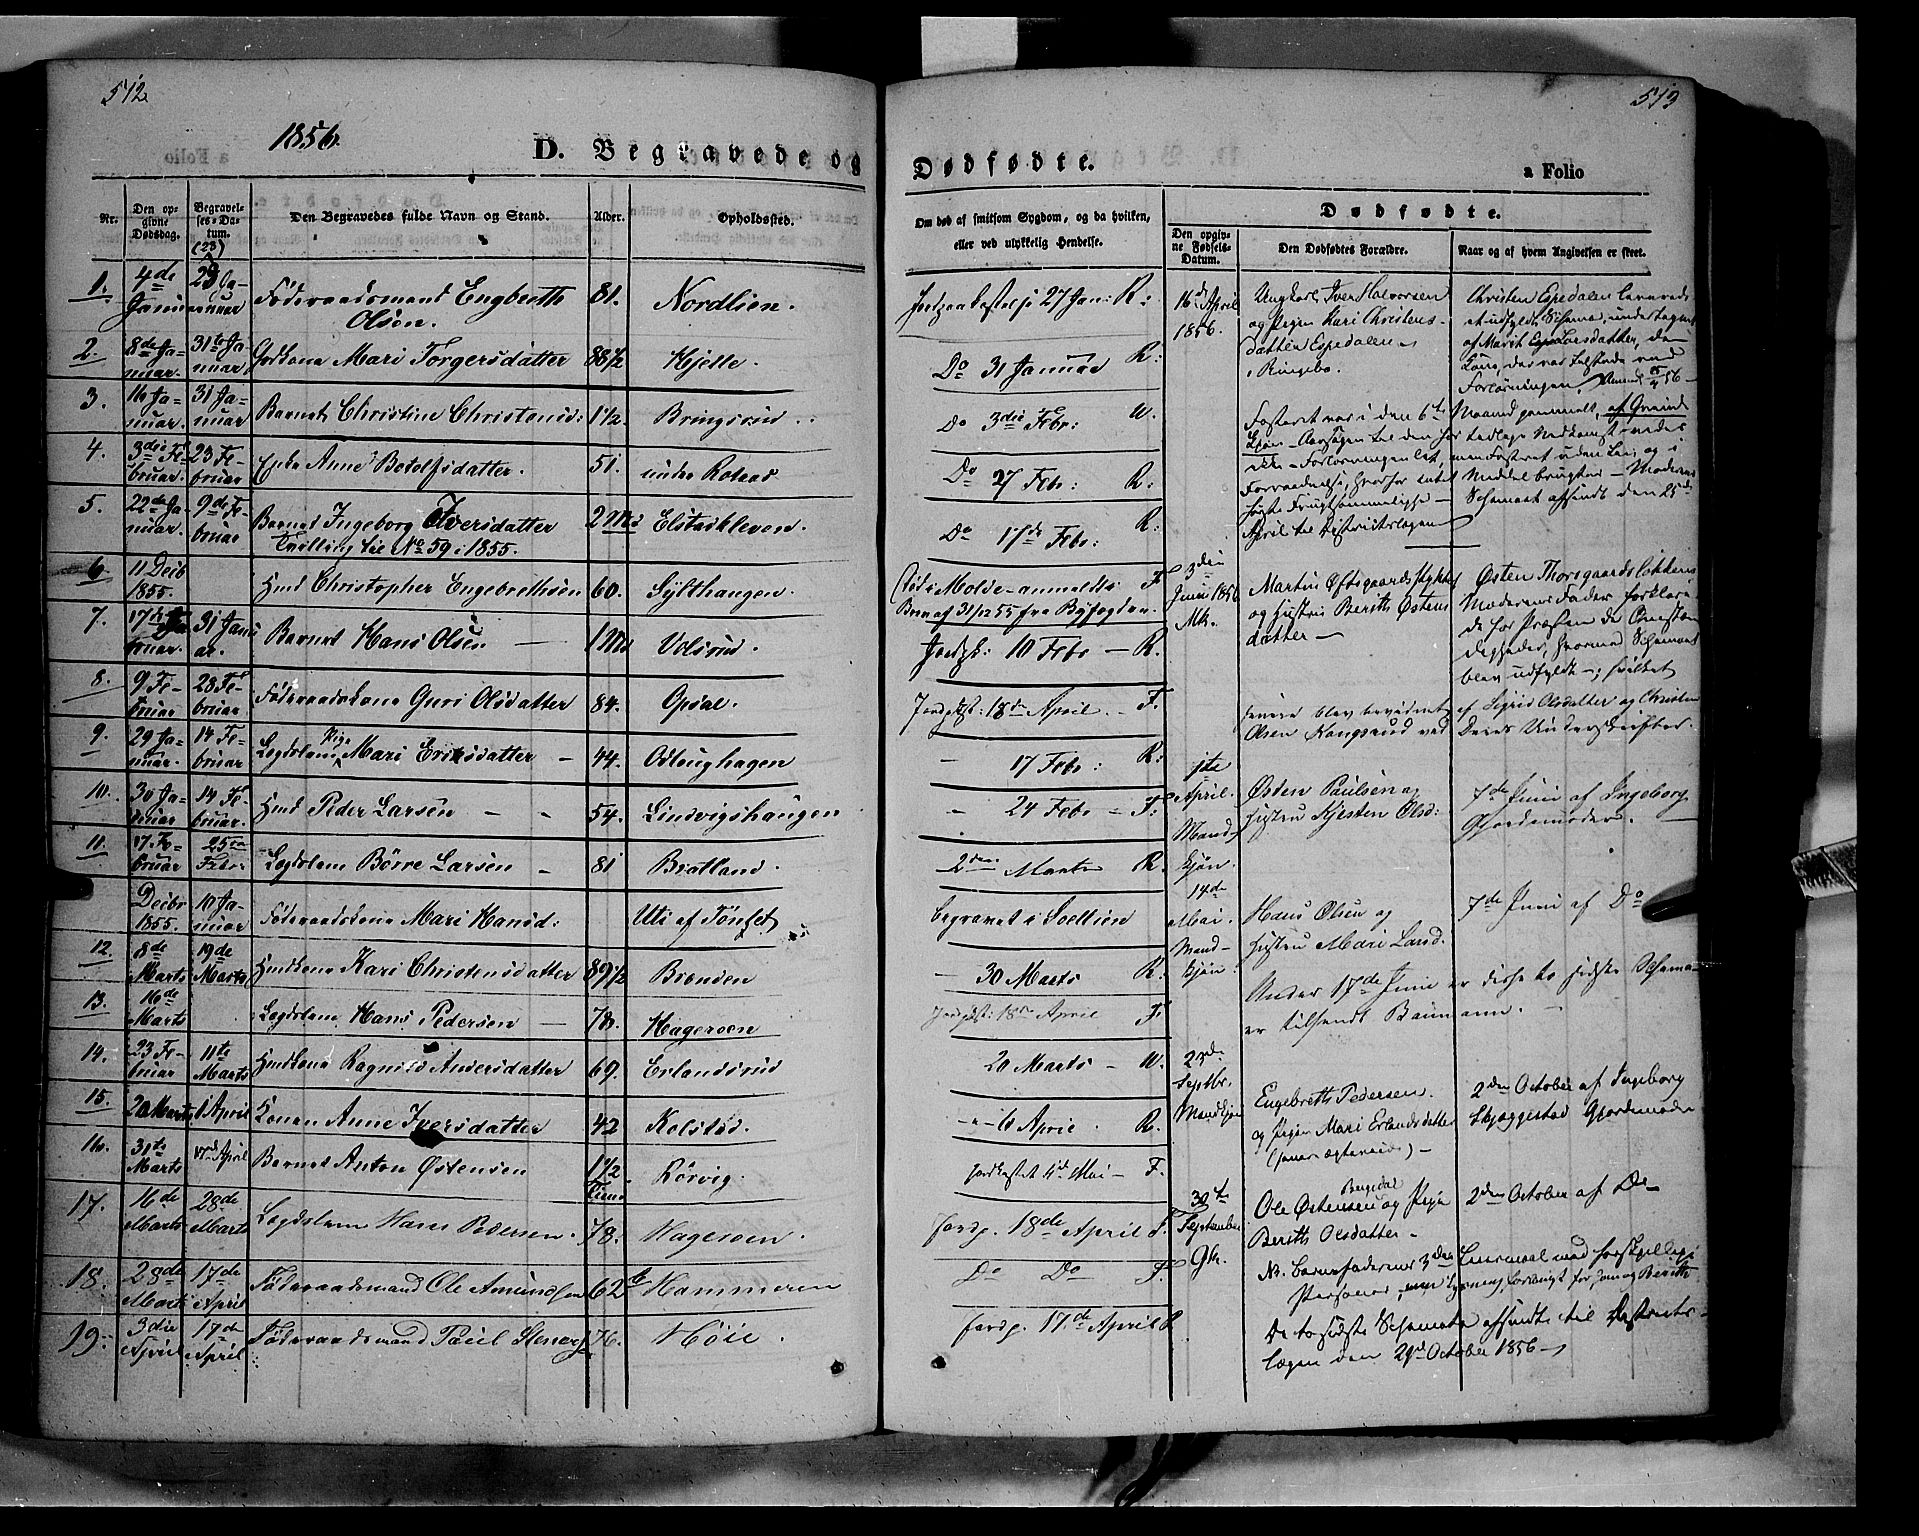 SAH, Ringebu prestekontor, Ministerialbok nr. 6, 1848-1859, s. 512-513